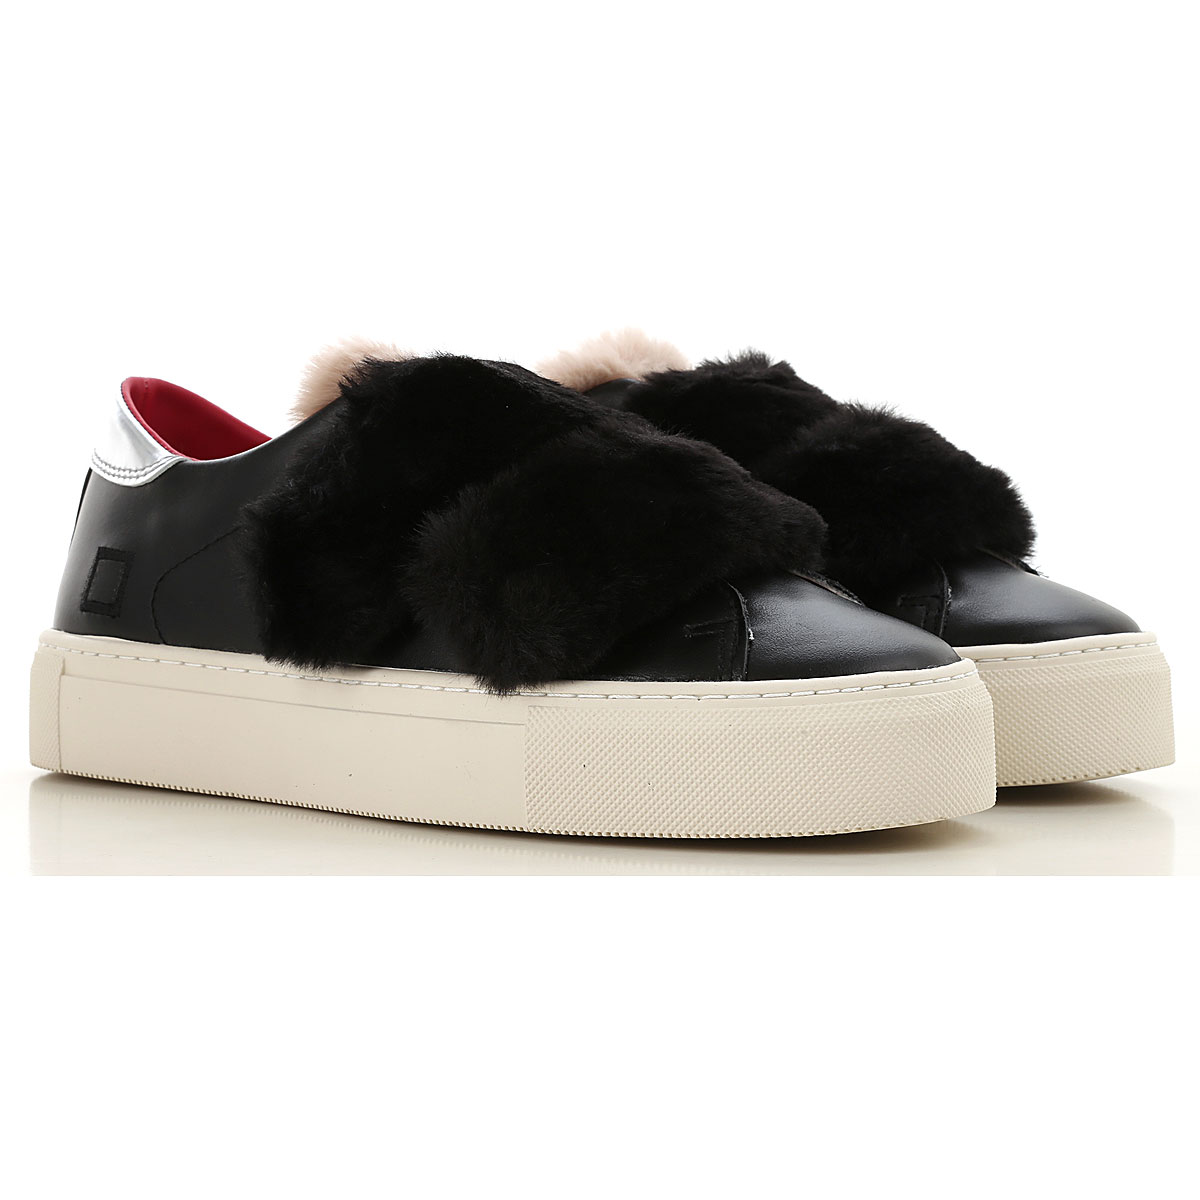 Image of D.A.T.E. Sneakers for Women, Black, Leather, 2017, US 6 - UK 3 5 - EU 36 - JP 22 5 US 8 - UK 5 5 - EU 38 5 - JP 24 5 US 6 5 - UK 4 - EU 37 - JP 23 US 7 5 - UK 5 - EU 38 - JP 24 US 9 - UK 6 5 - EU 40 - JP 25 5